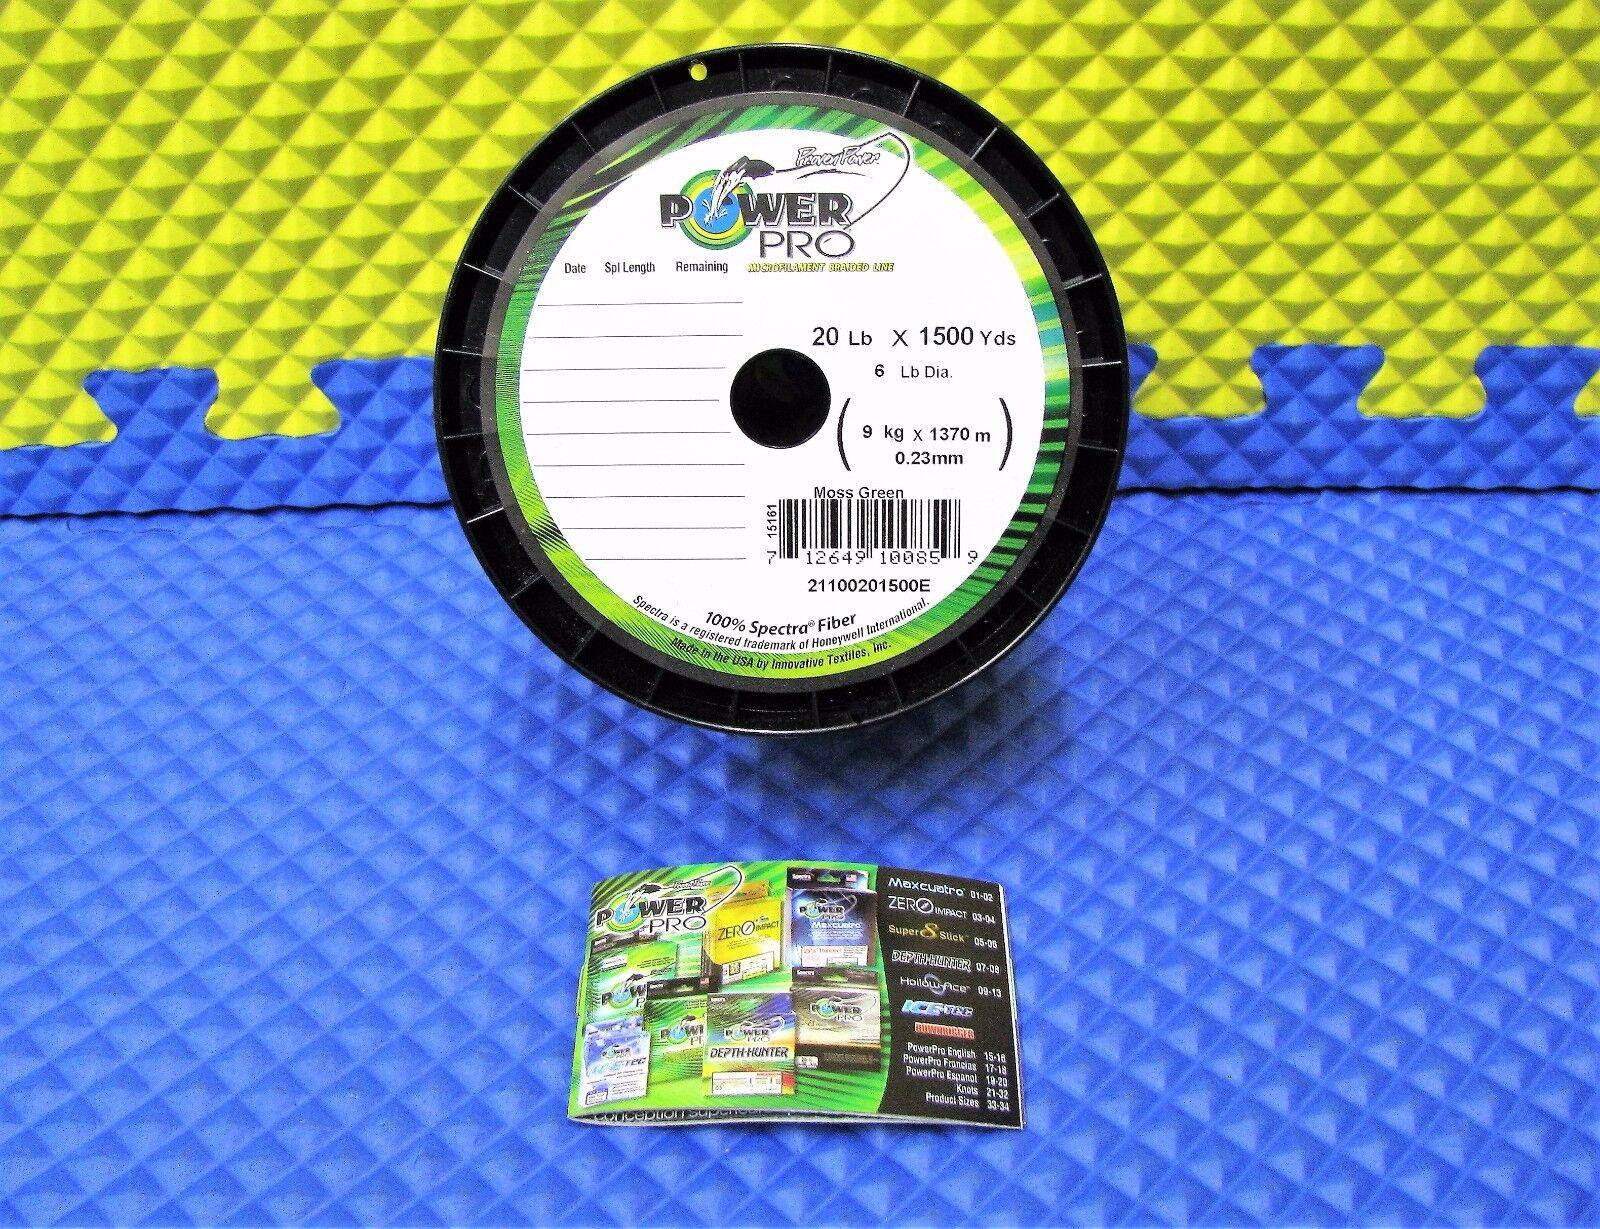 Power Pro Microfilament Braided Fishing Line 20 lb. 1500 yds. Moss Green 15161